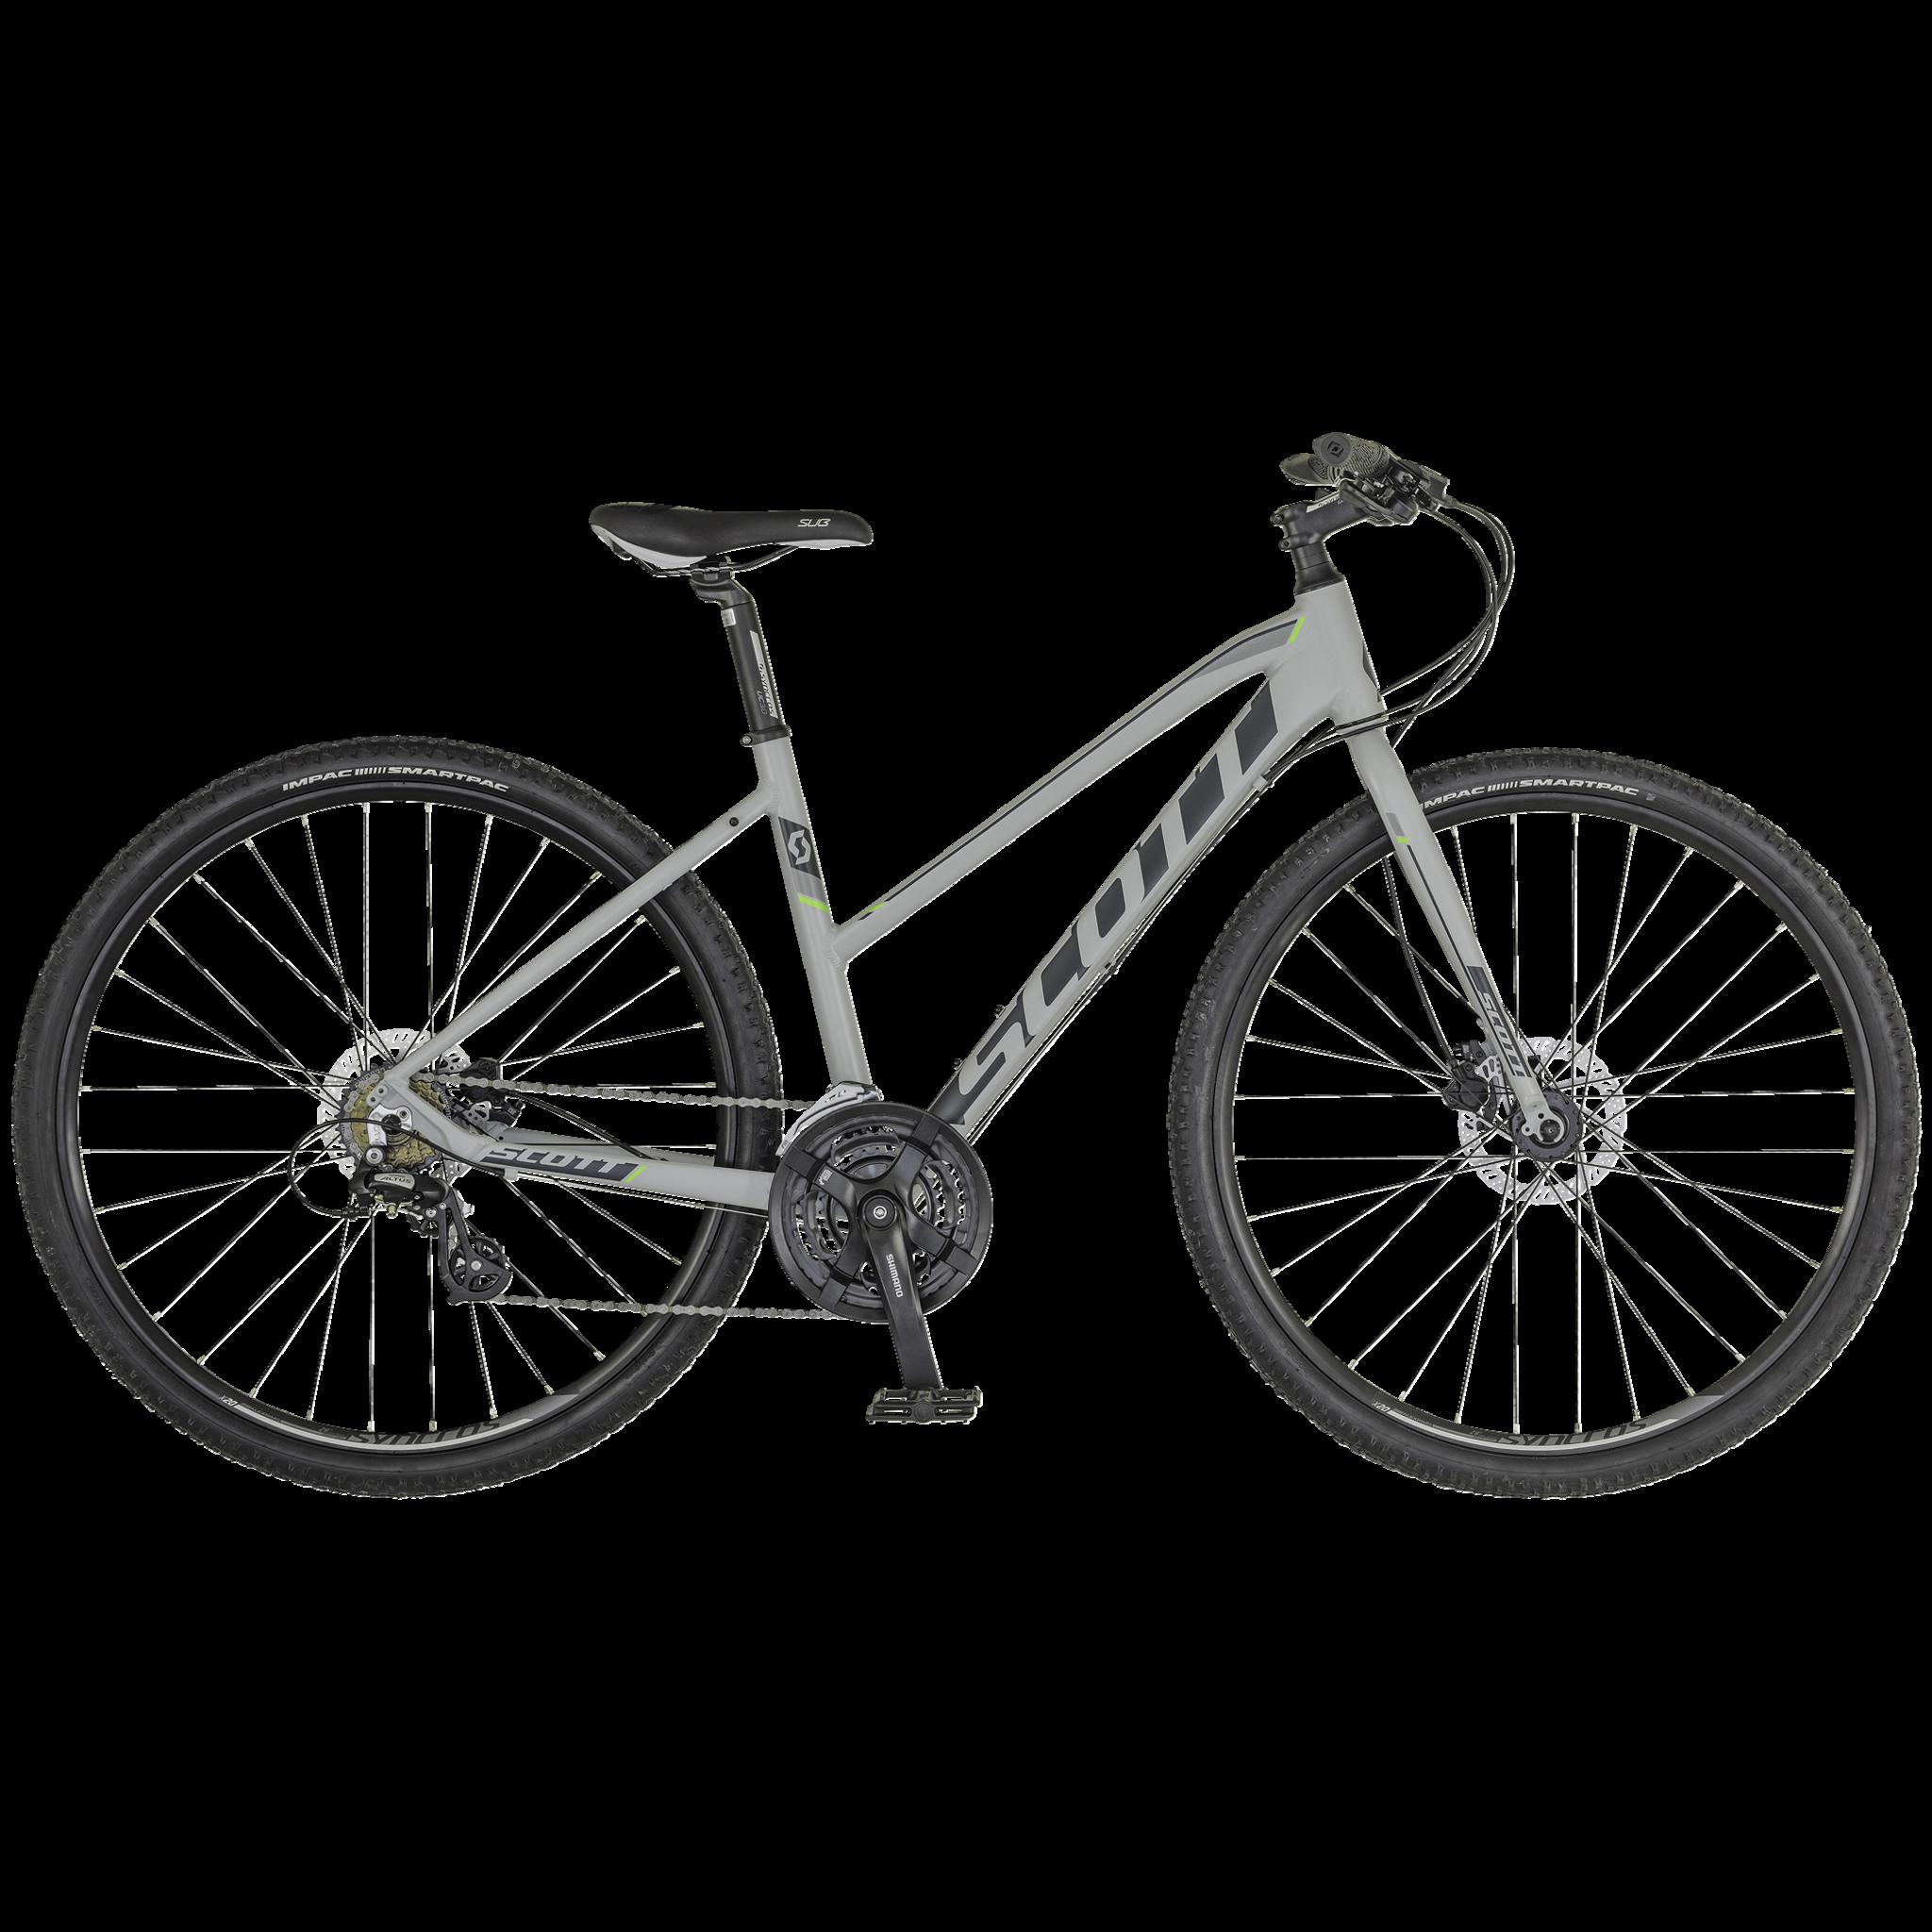 Scott SUB Cross Tour HD 18, hybridsykkel dame S 16